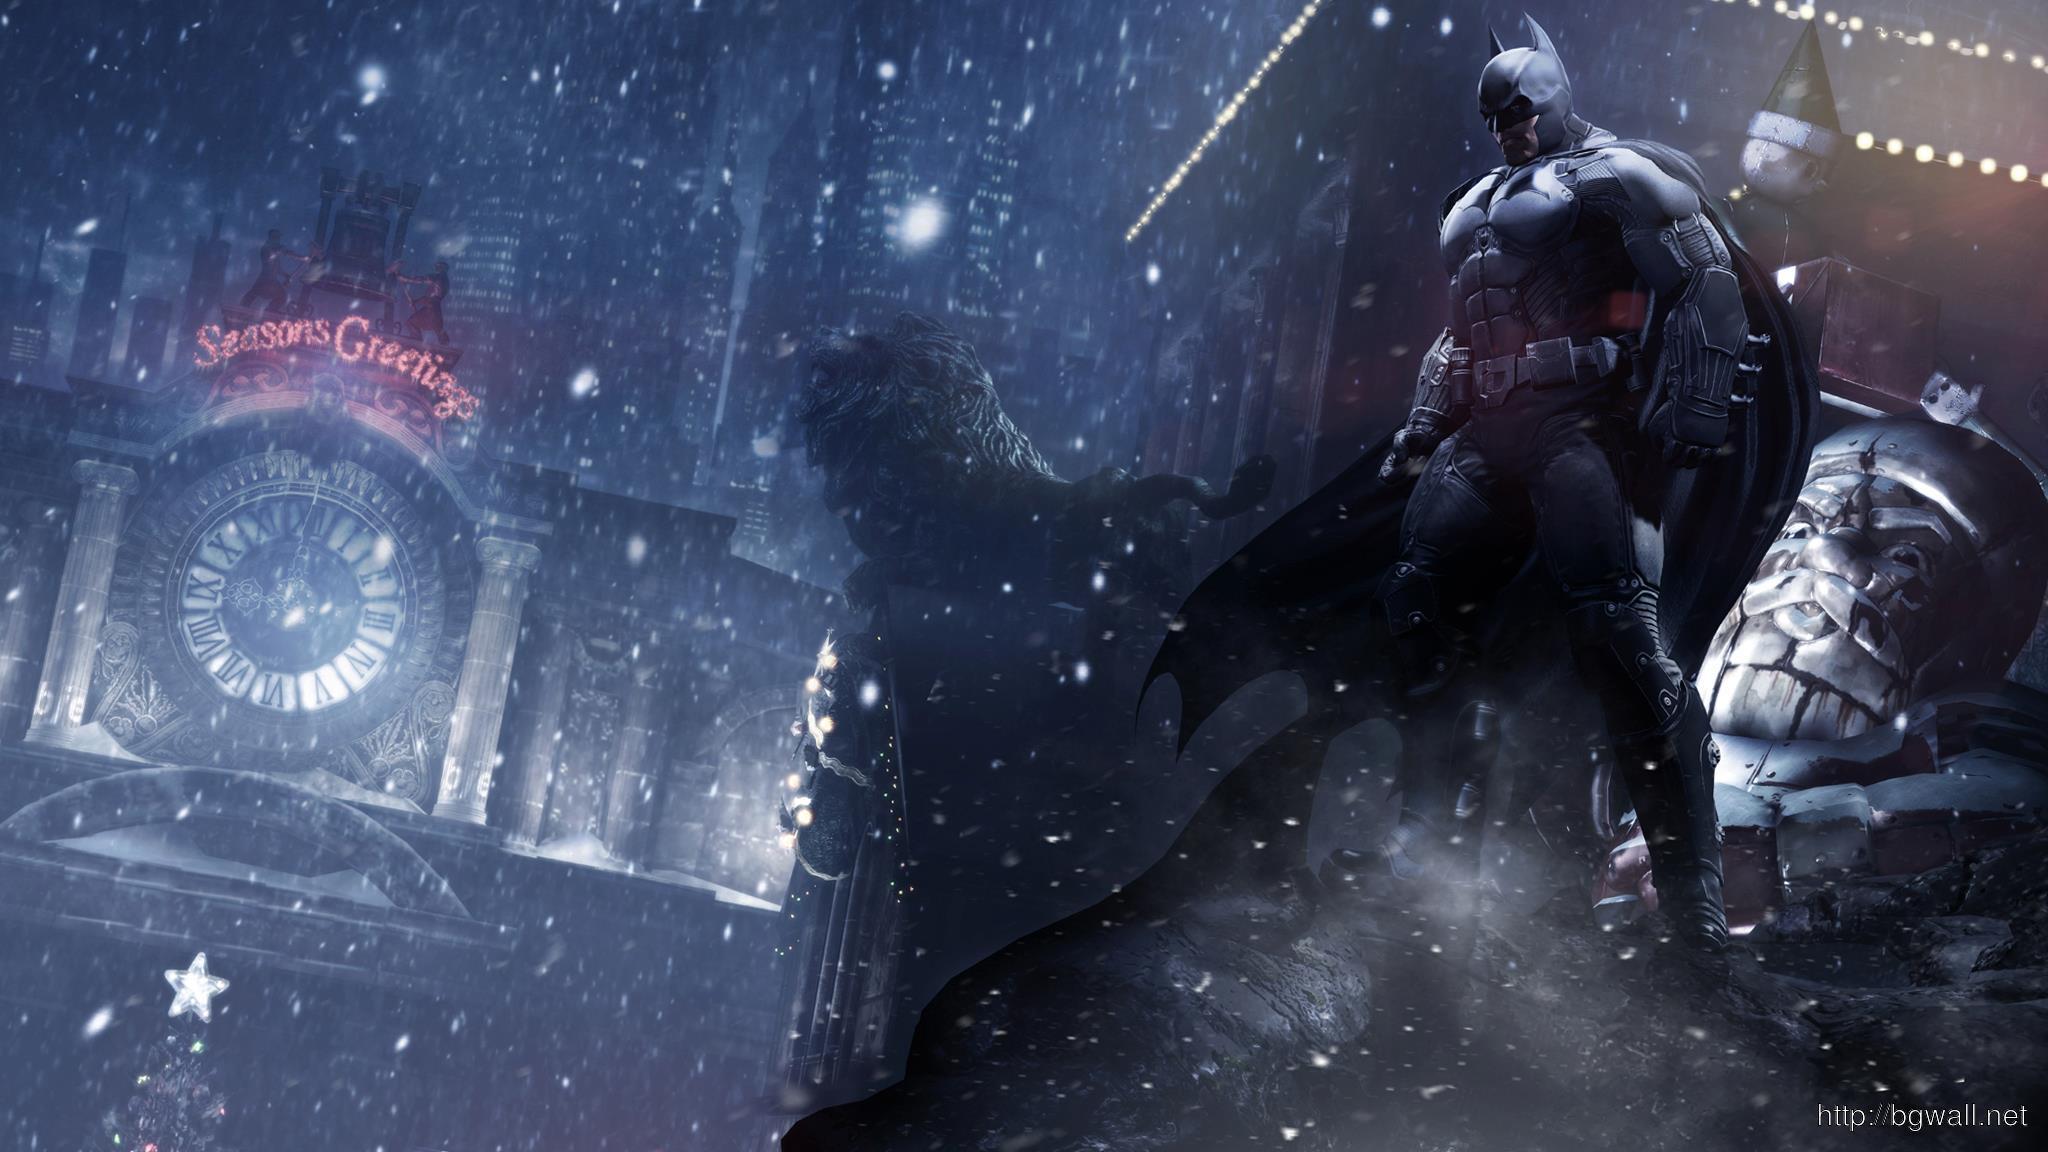 Batman Arkham Origins On Roof Wallpaper Full Size